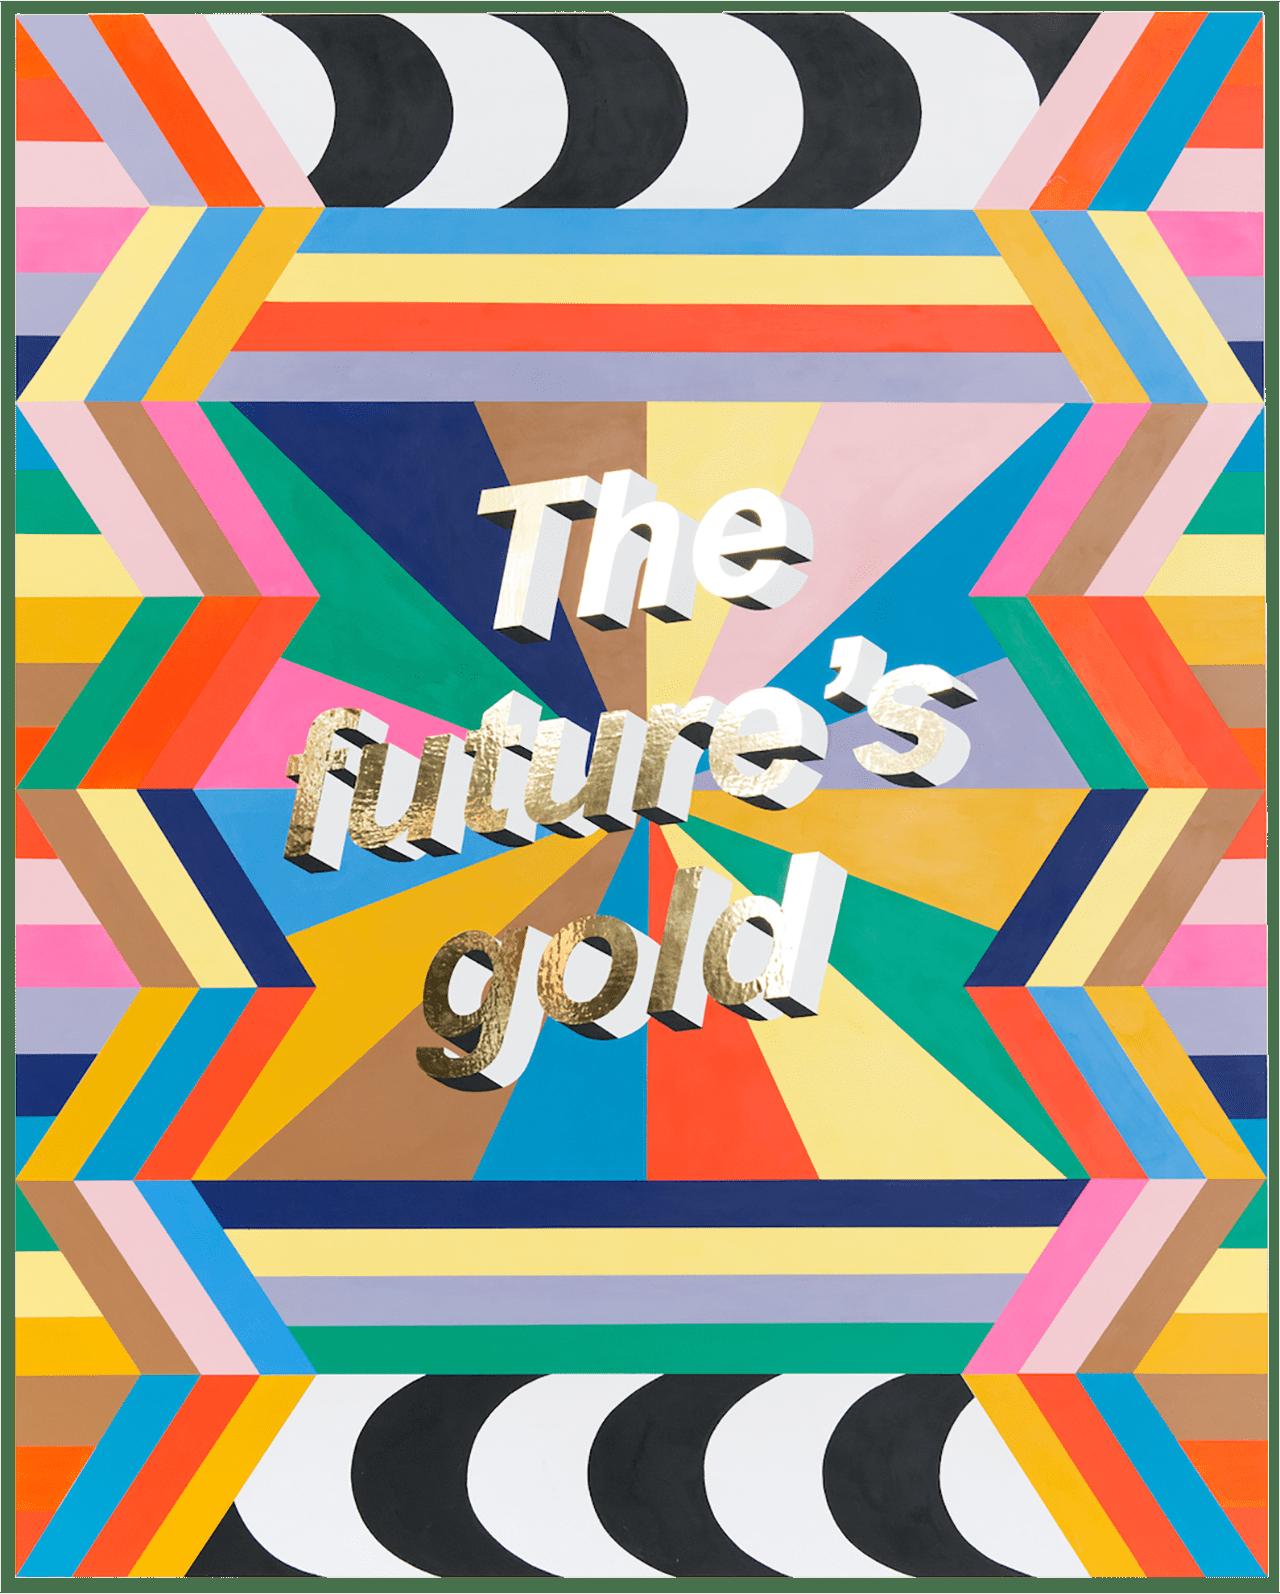 The Future's Gold, 2017